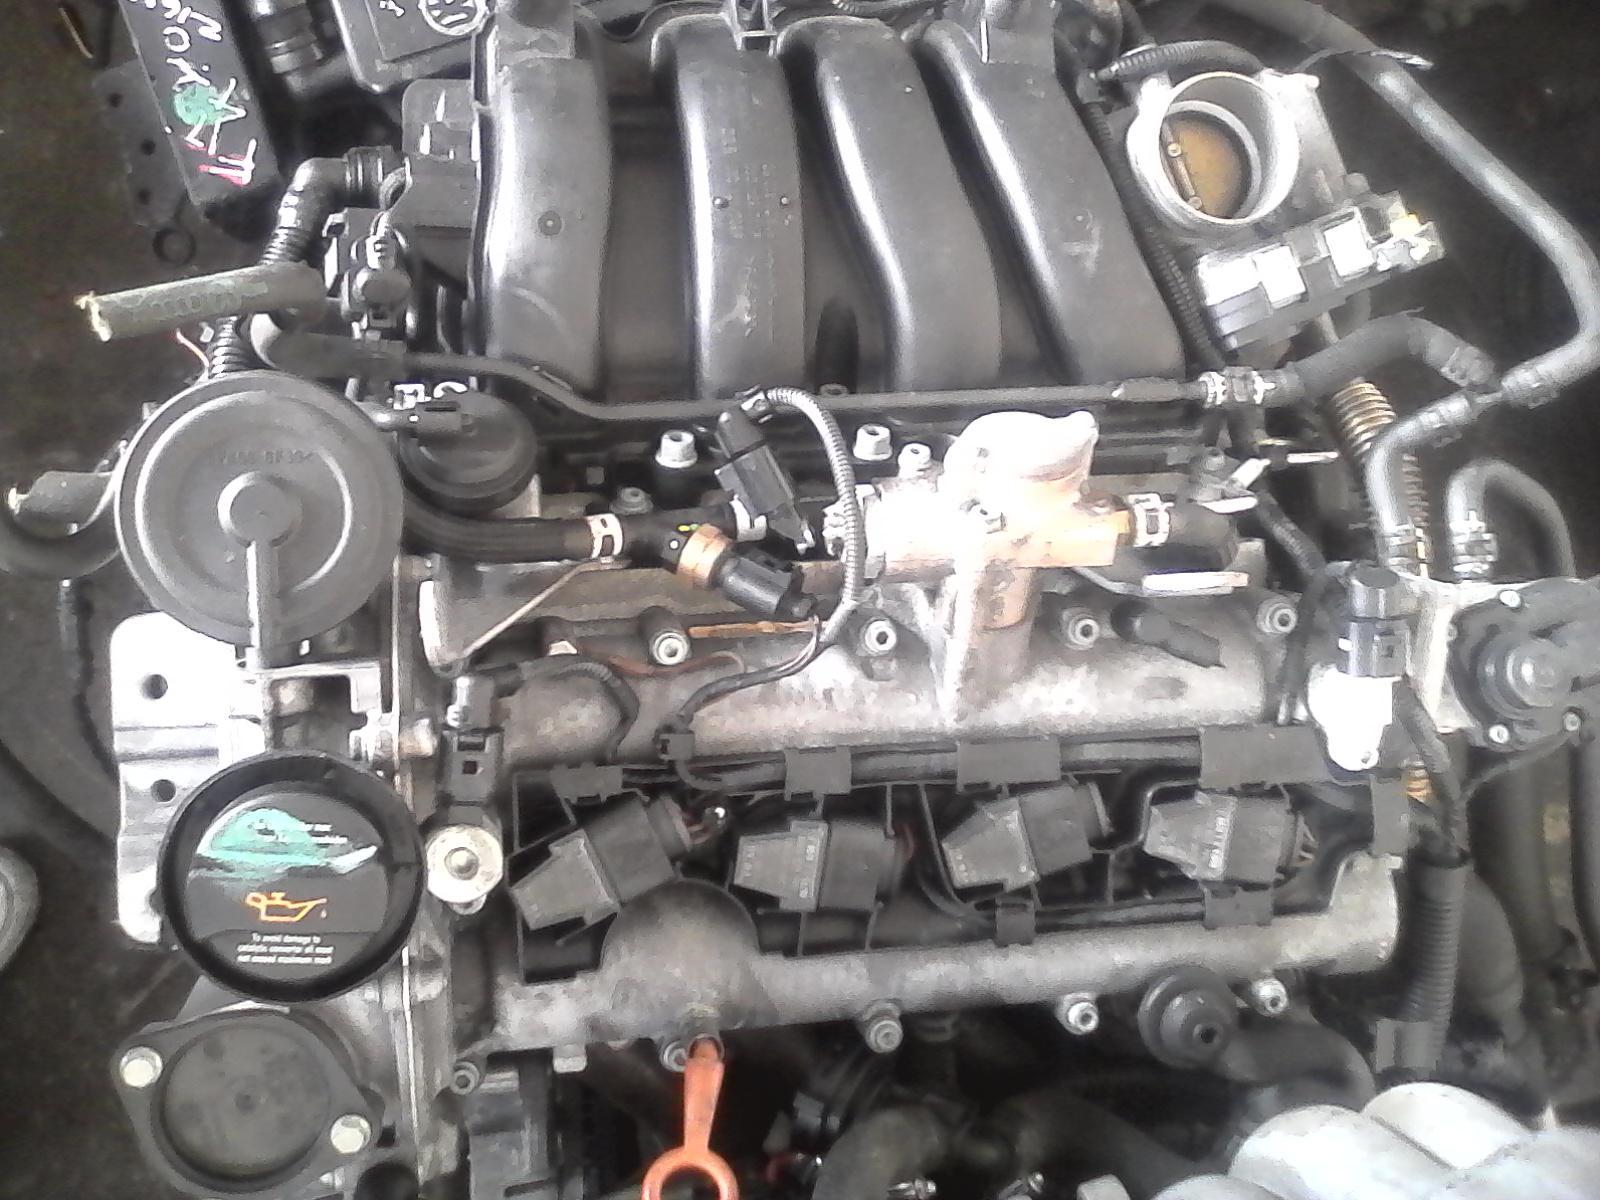 Vw Golf 5 1 6fsi Blf Engine For Sale Johannesburg